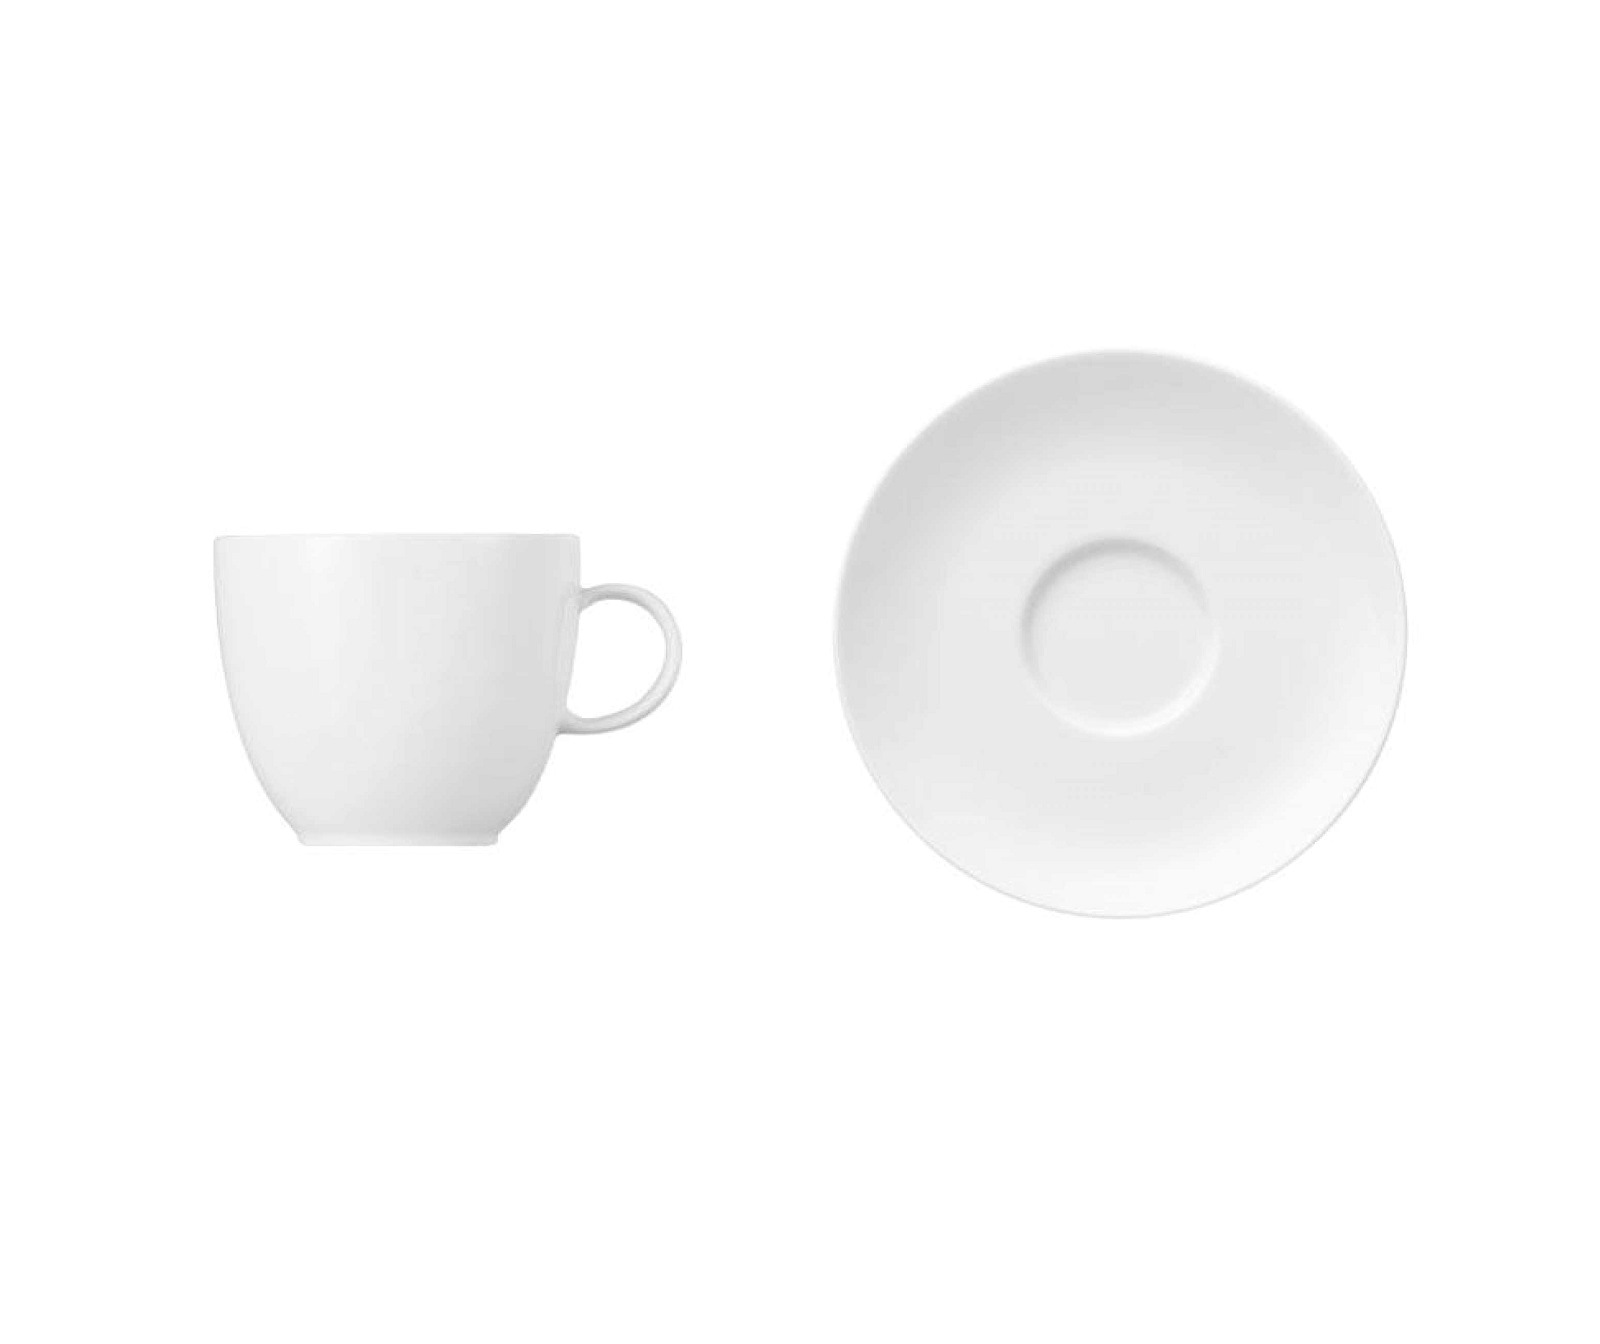 Онлайн каталог PROMENU: Чашка с блюдцем Rosenthal SUNNY DAY, объем 0,2 л, белый, 2 предмета Rosenthal 70850-800001-14742_SET